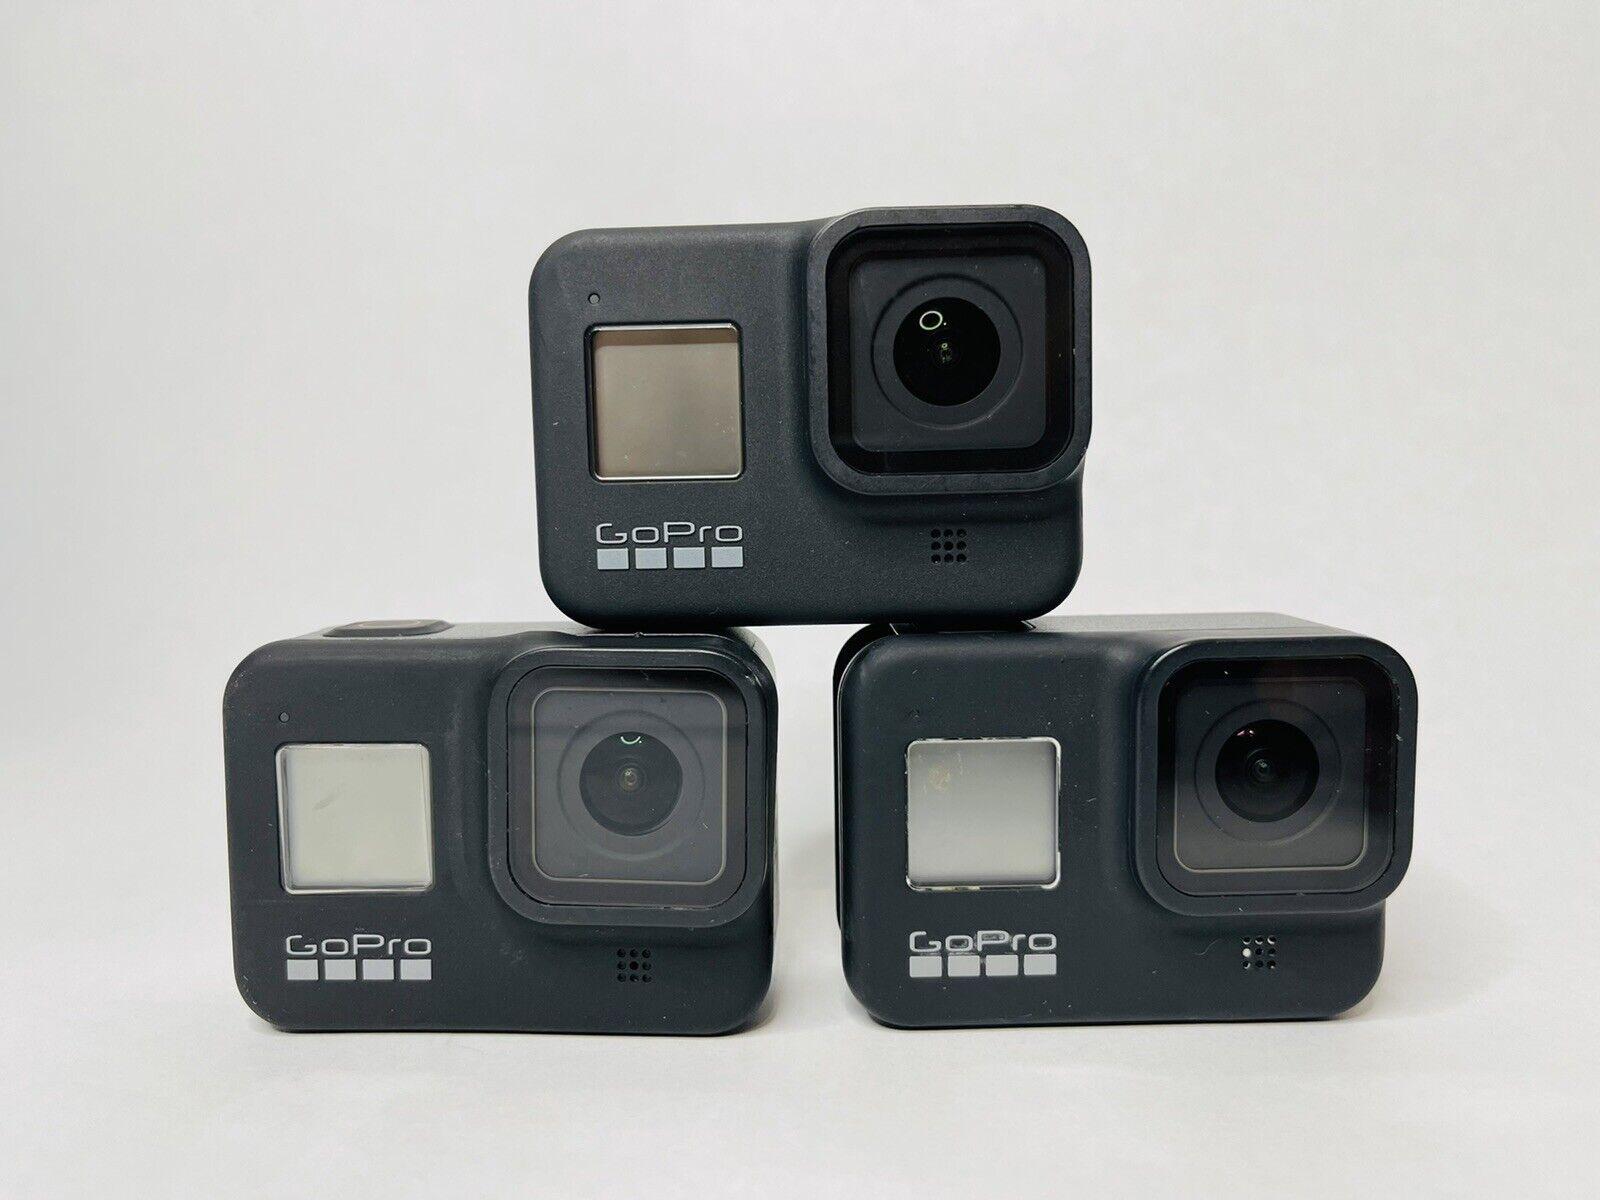 GoPro HERO8 Black Action Camera Lot Of 3 For Parts/Repair - NO POWER